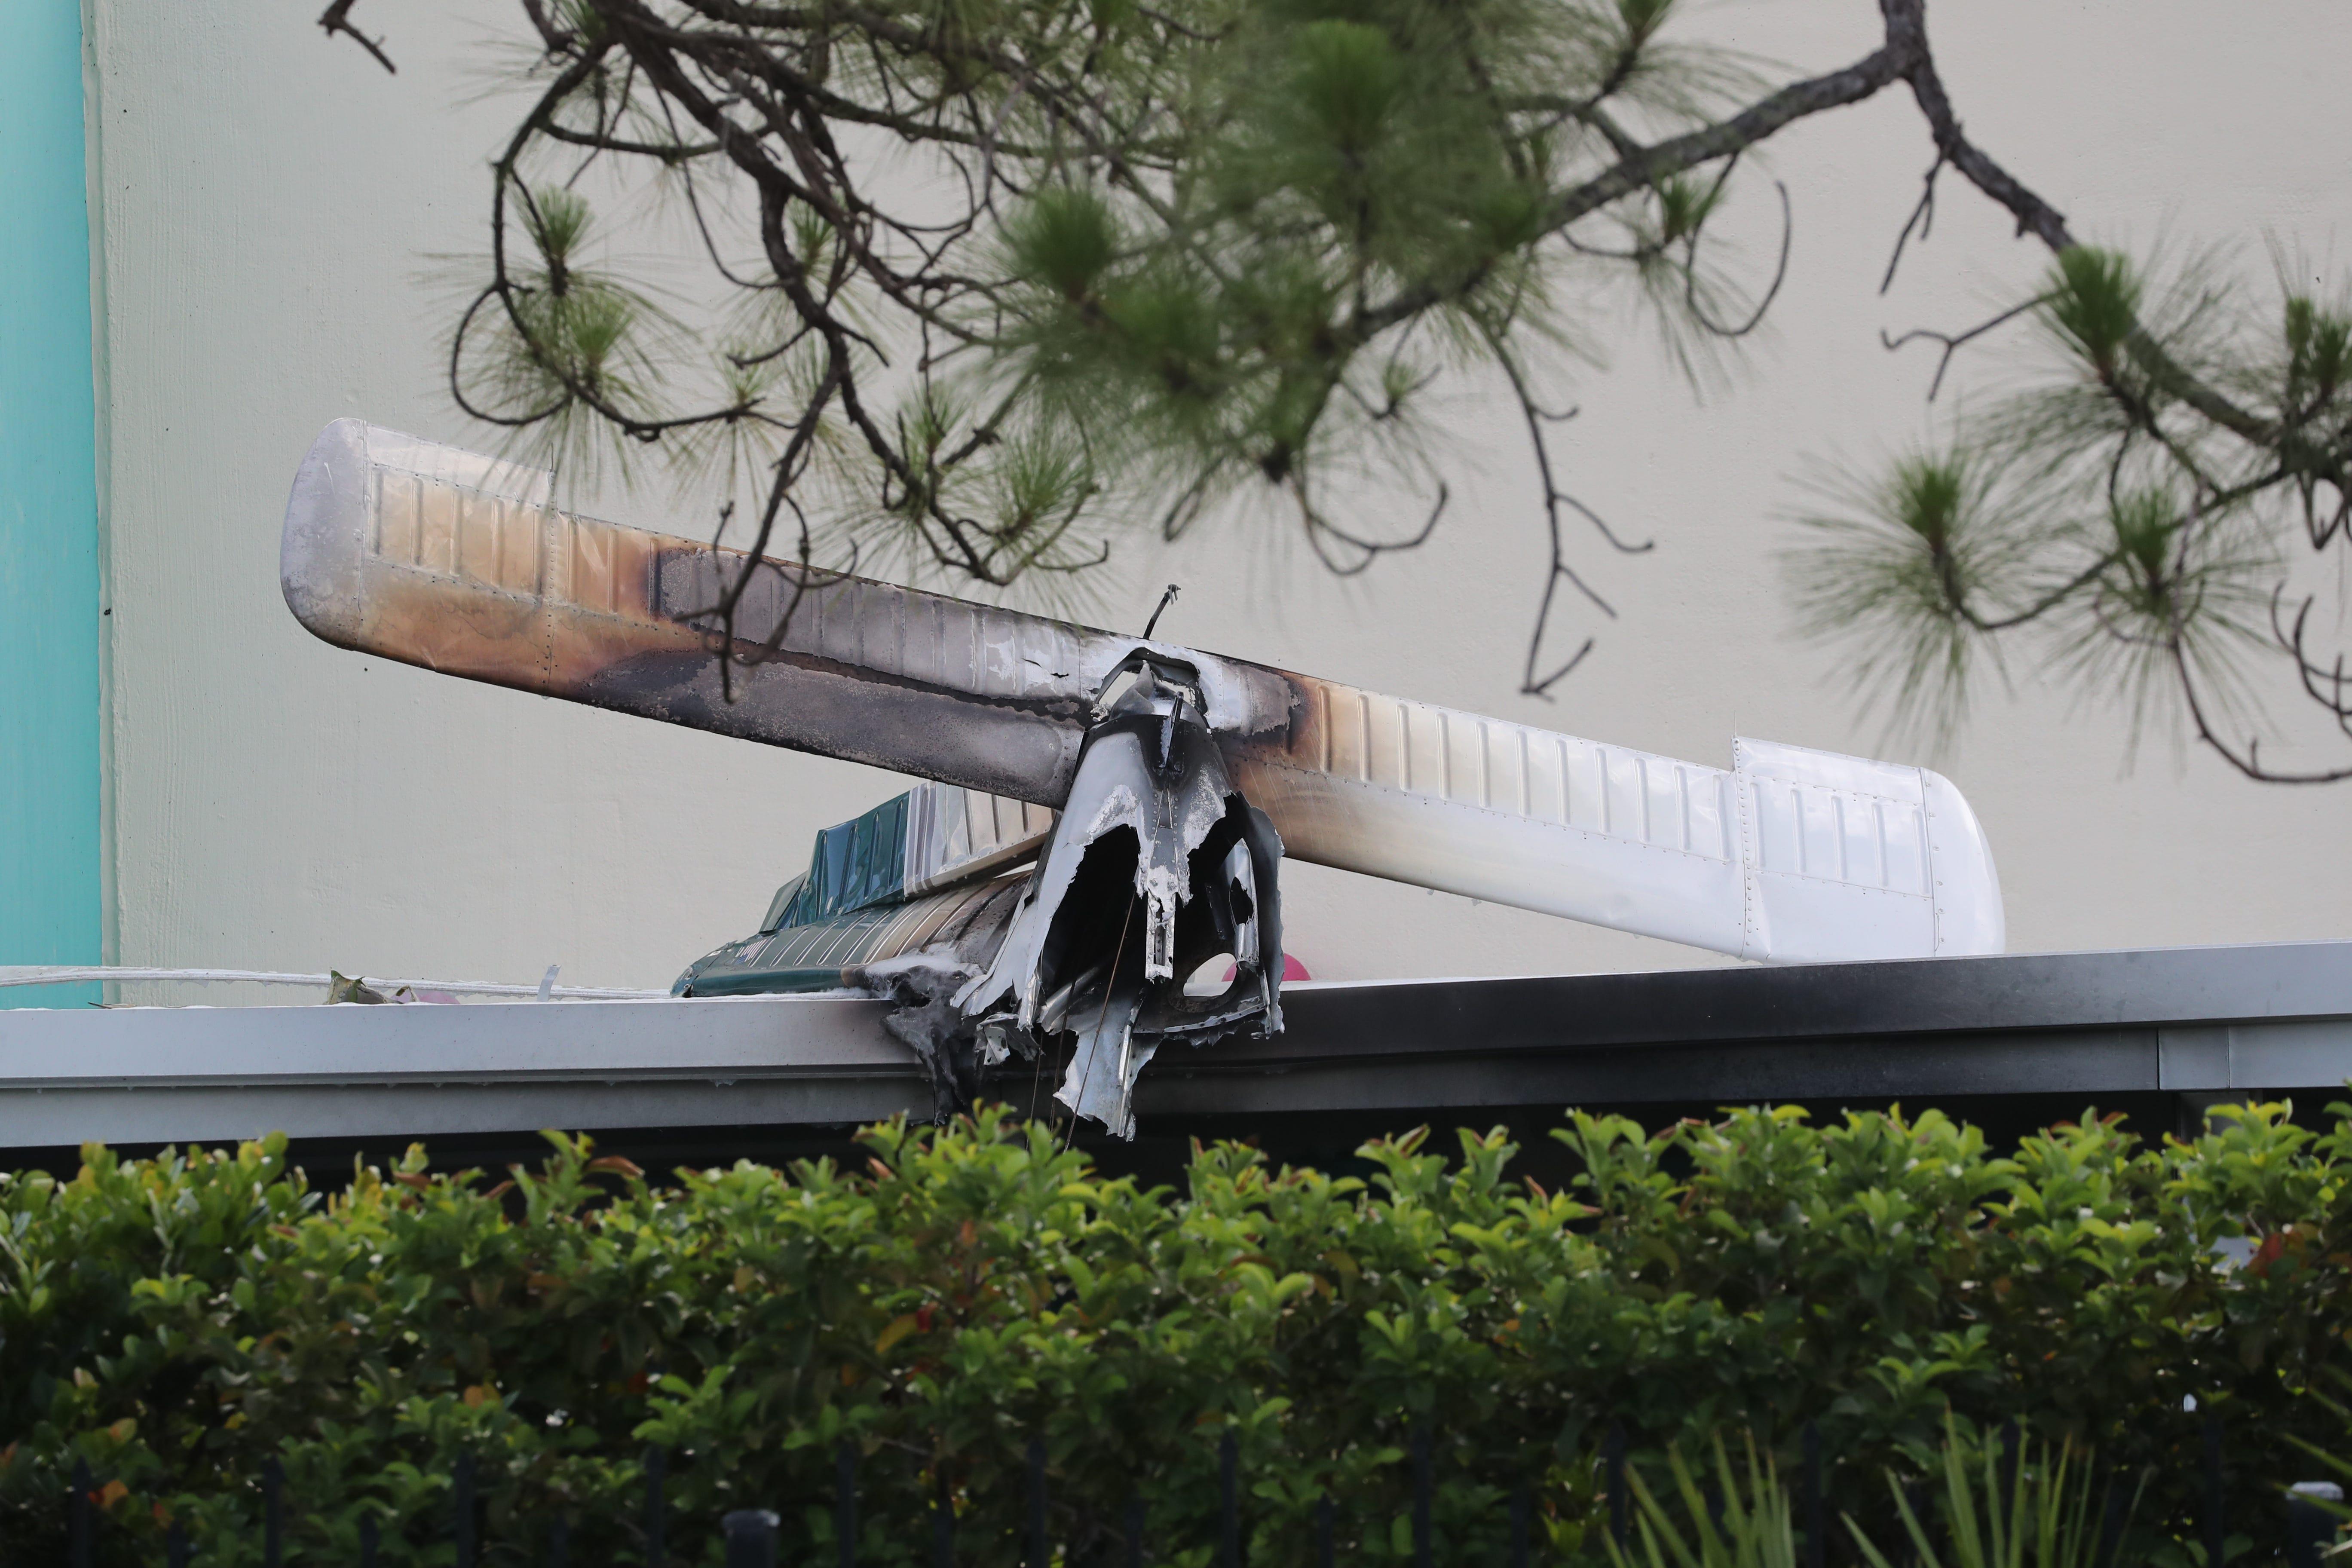 1 killed in South Florida plane crash